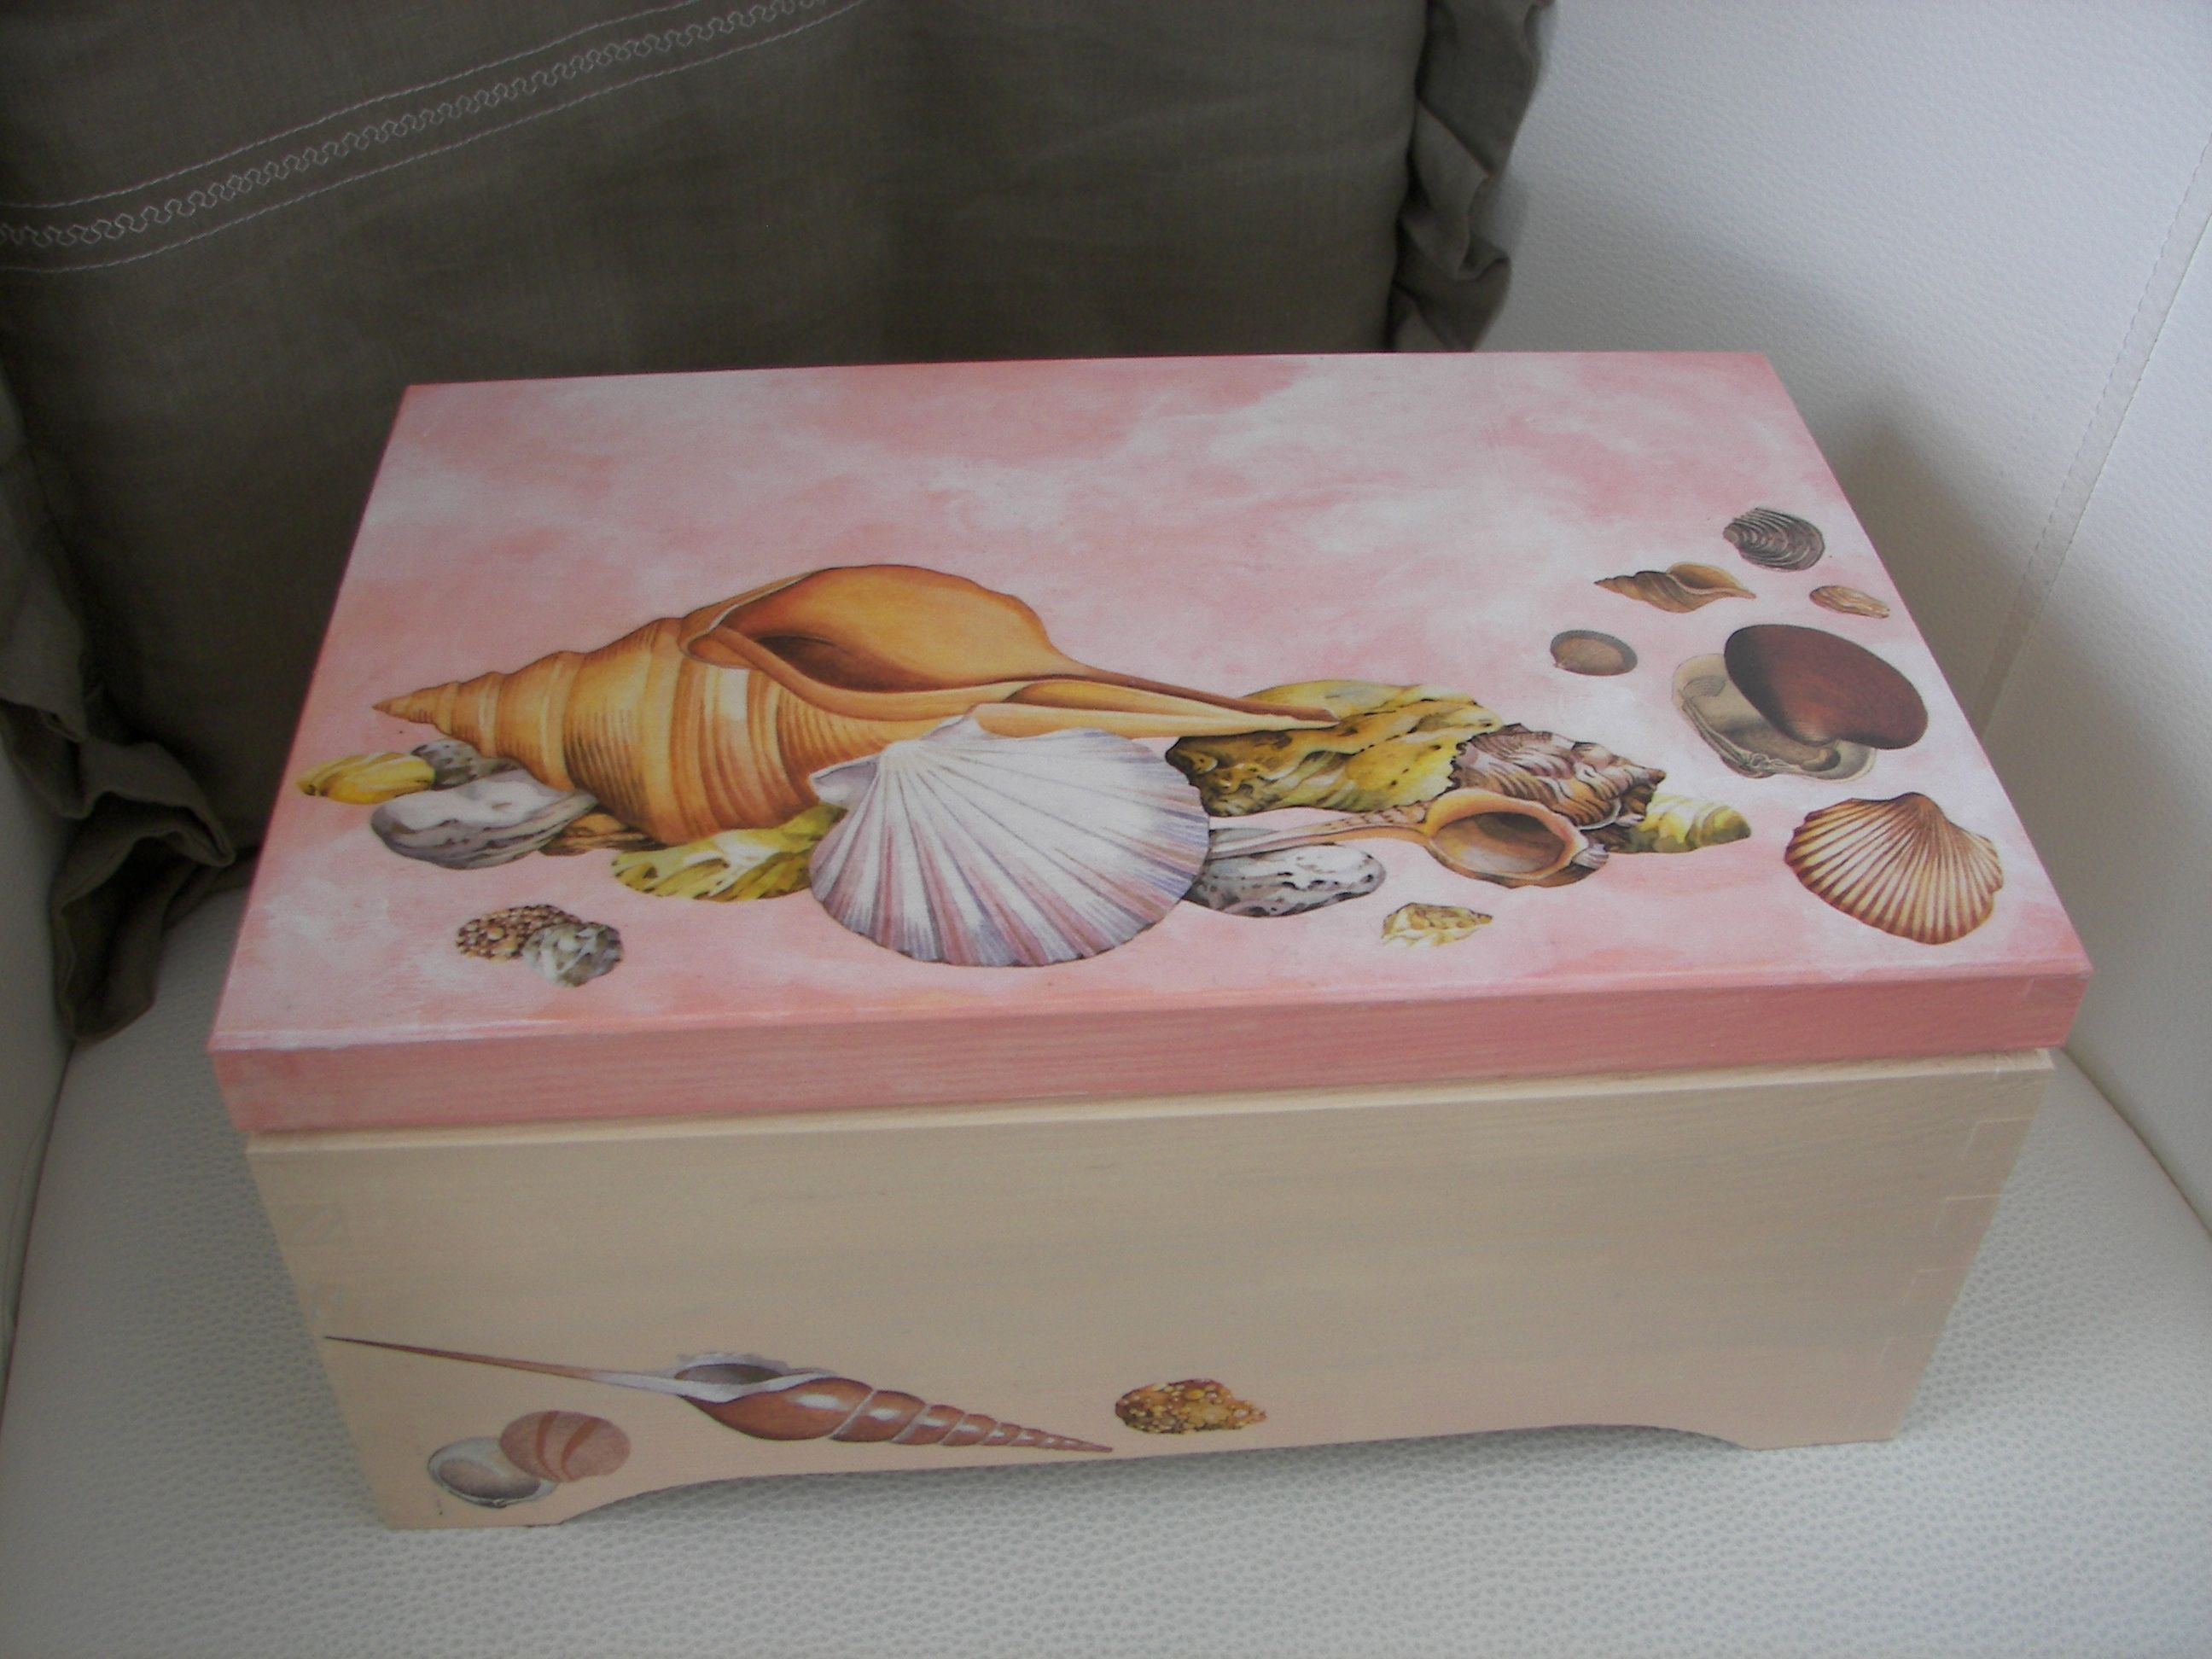 Ideas To Decorate A Box Decoupage Box  Cajas Decoradas Pinterest  Decoupage Box And